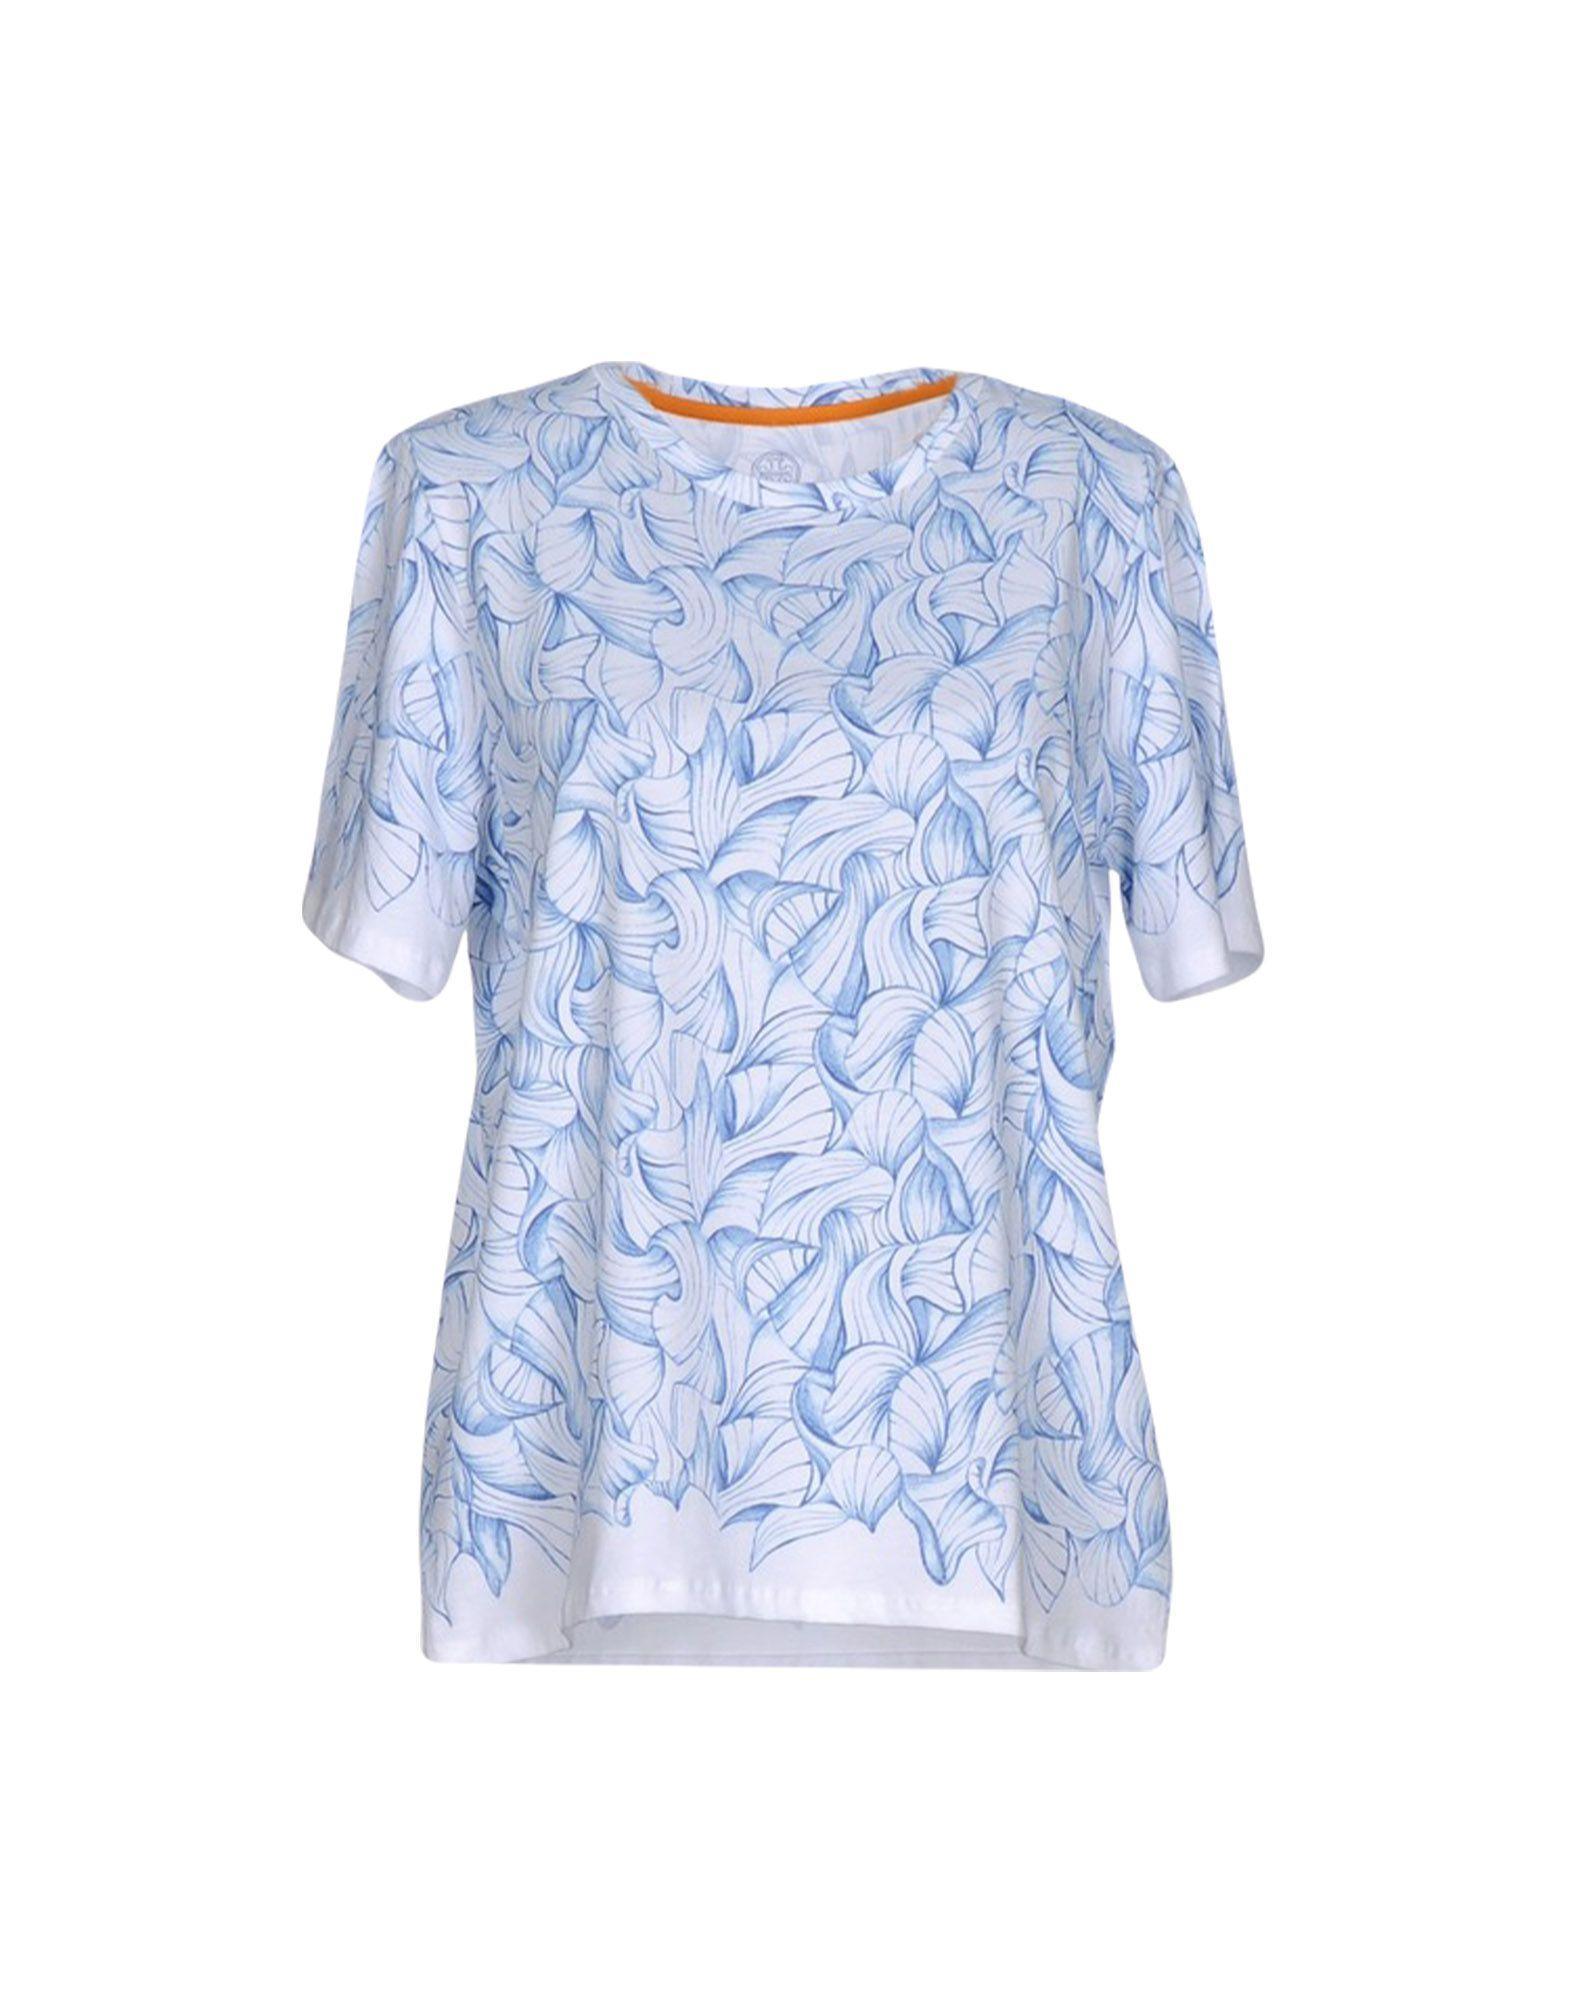 Tory burch t shirt in blue lyst for Tory burch t shirt